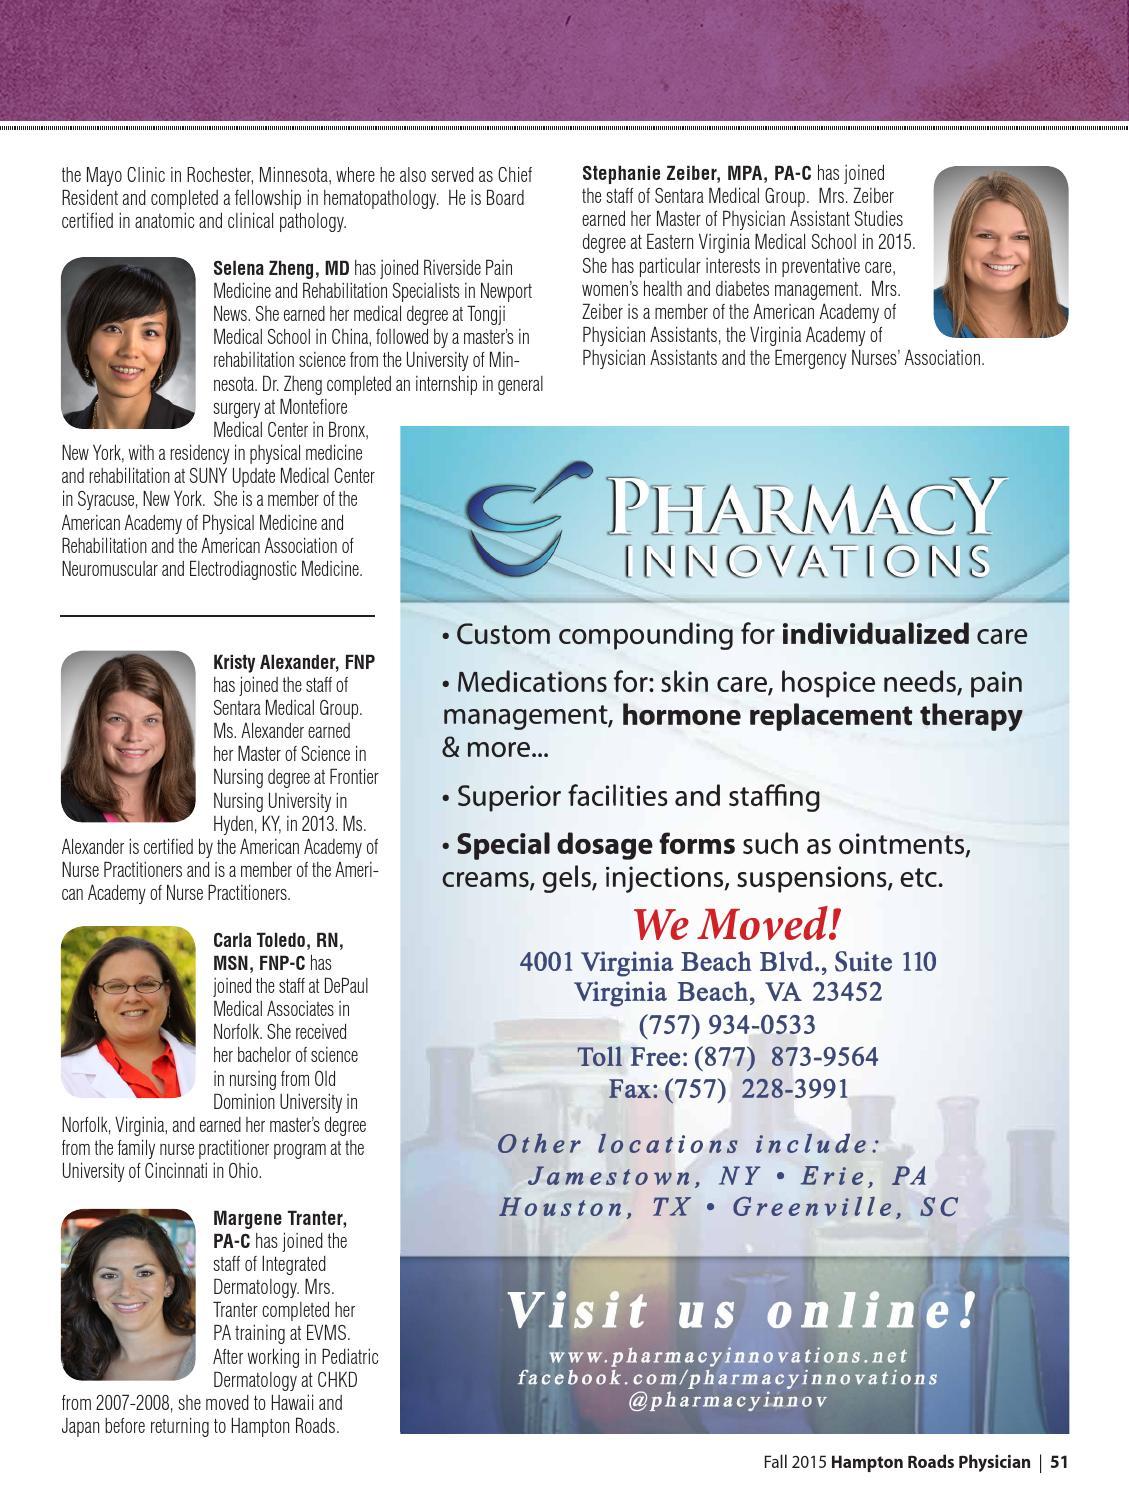 Hampton Roads Physician 2015 by Hampton Roads Physician Magazine - issuu